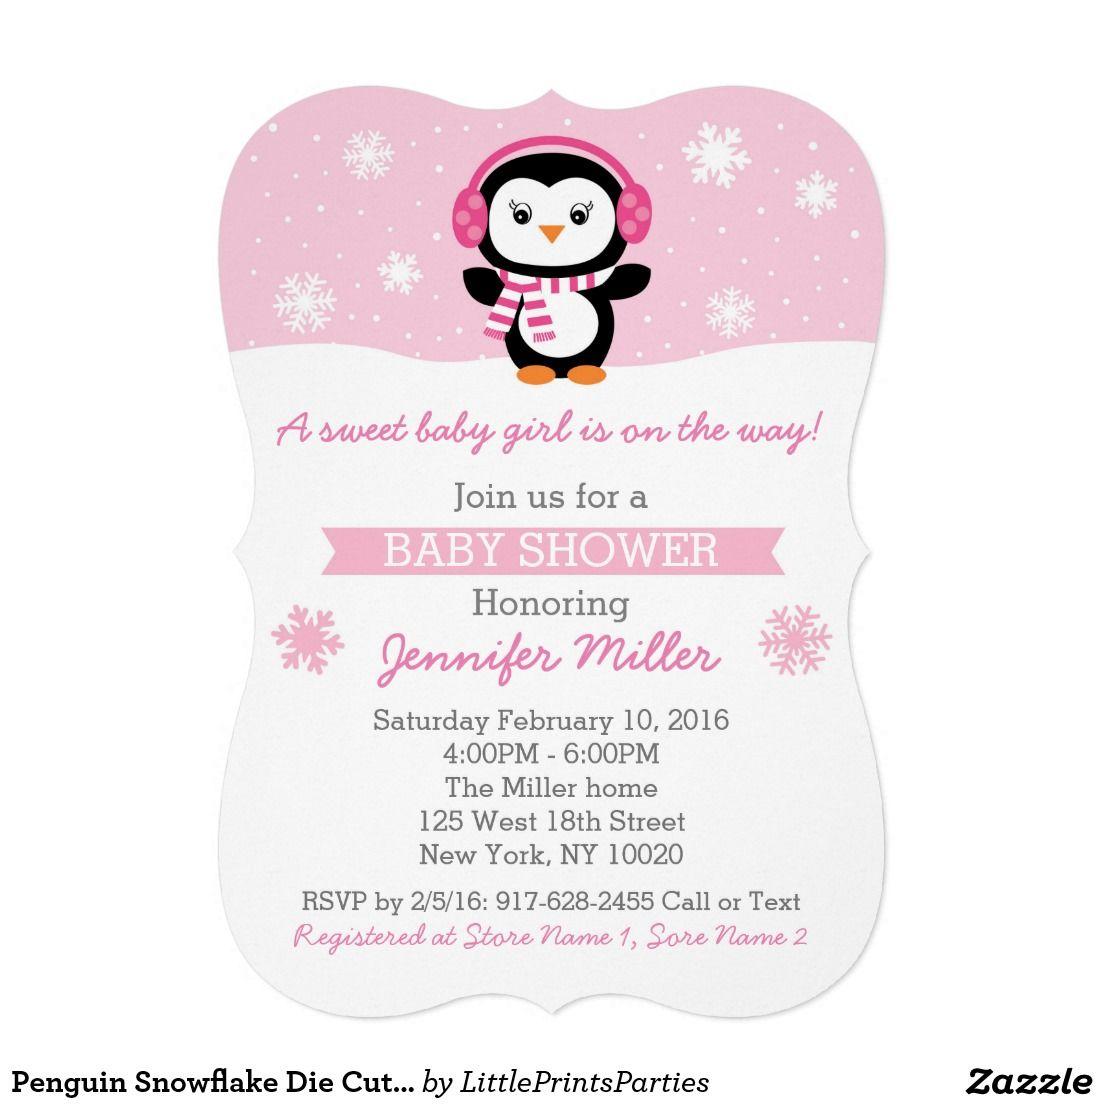 Penguin Snowflake Die Cut Baby Shower Invitations | Baby Shower ...